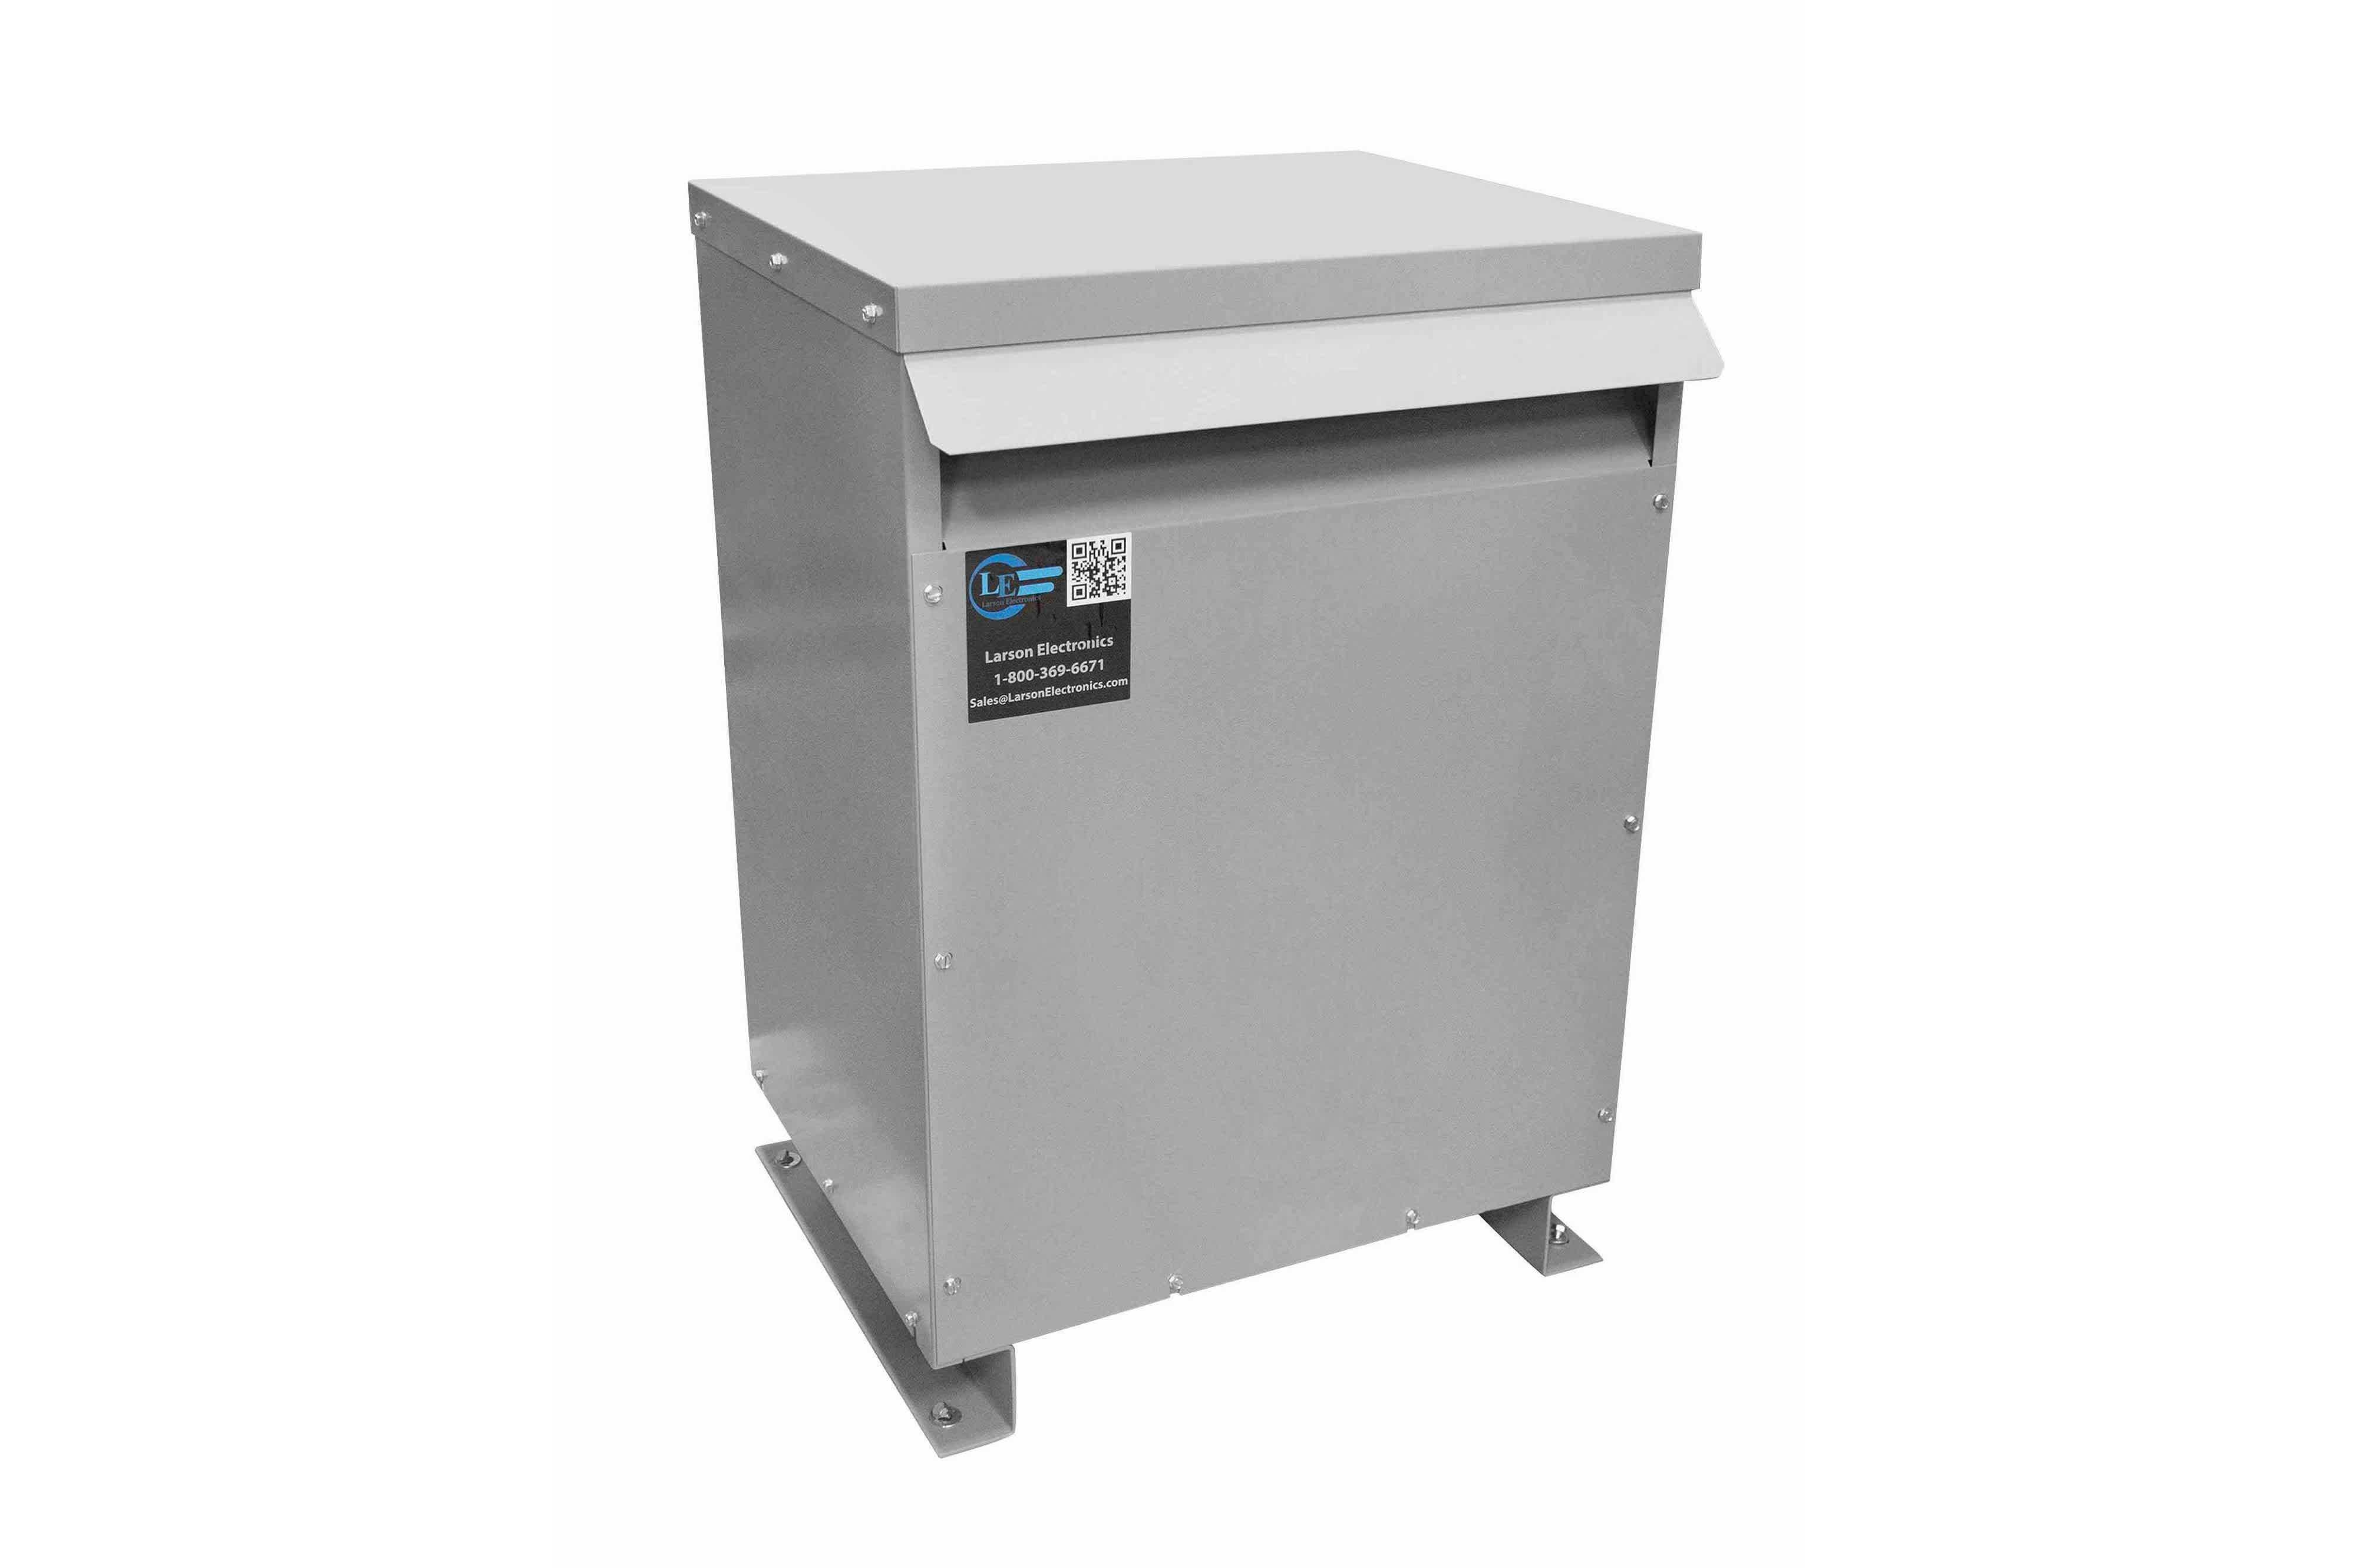 55 kVA 3PH Isolation Transformer, 460V Wye Primary, 575Y/332 Wye-N Secondary, N3R, Ventilated, 60 Hz